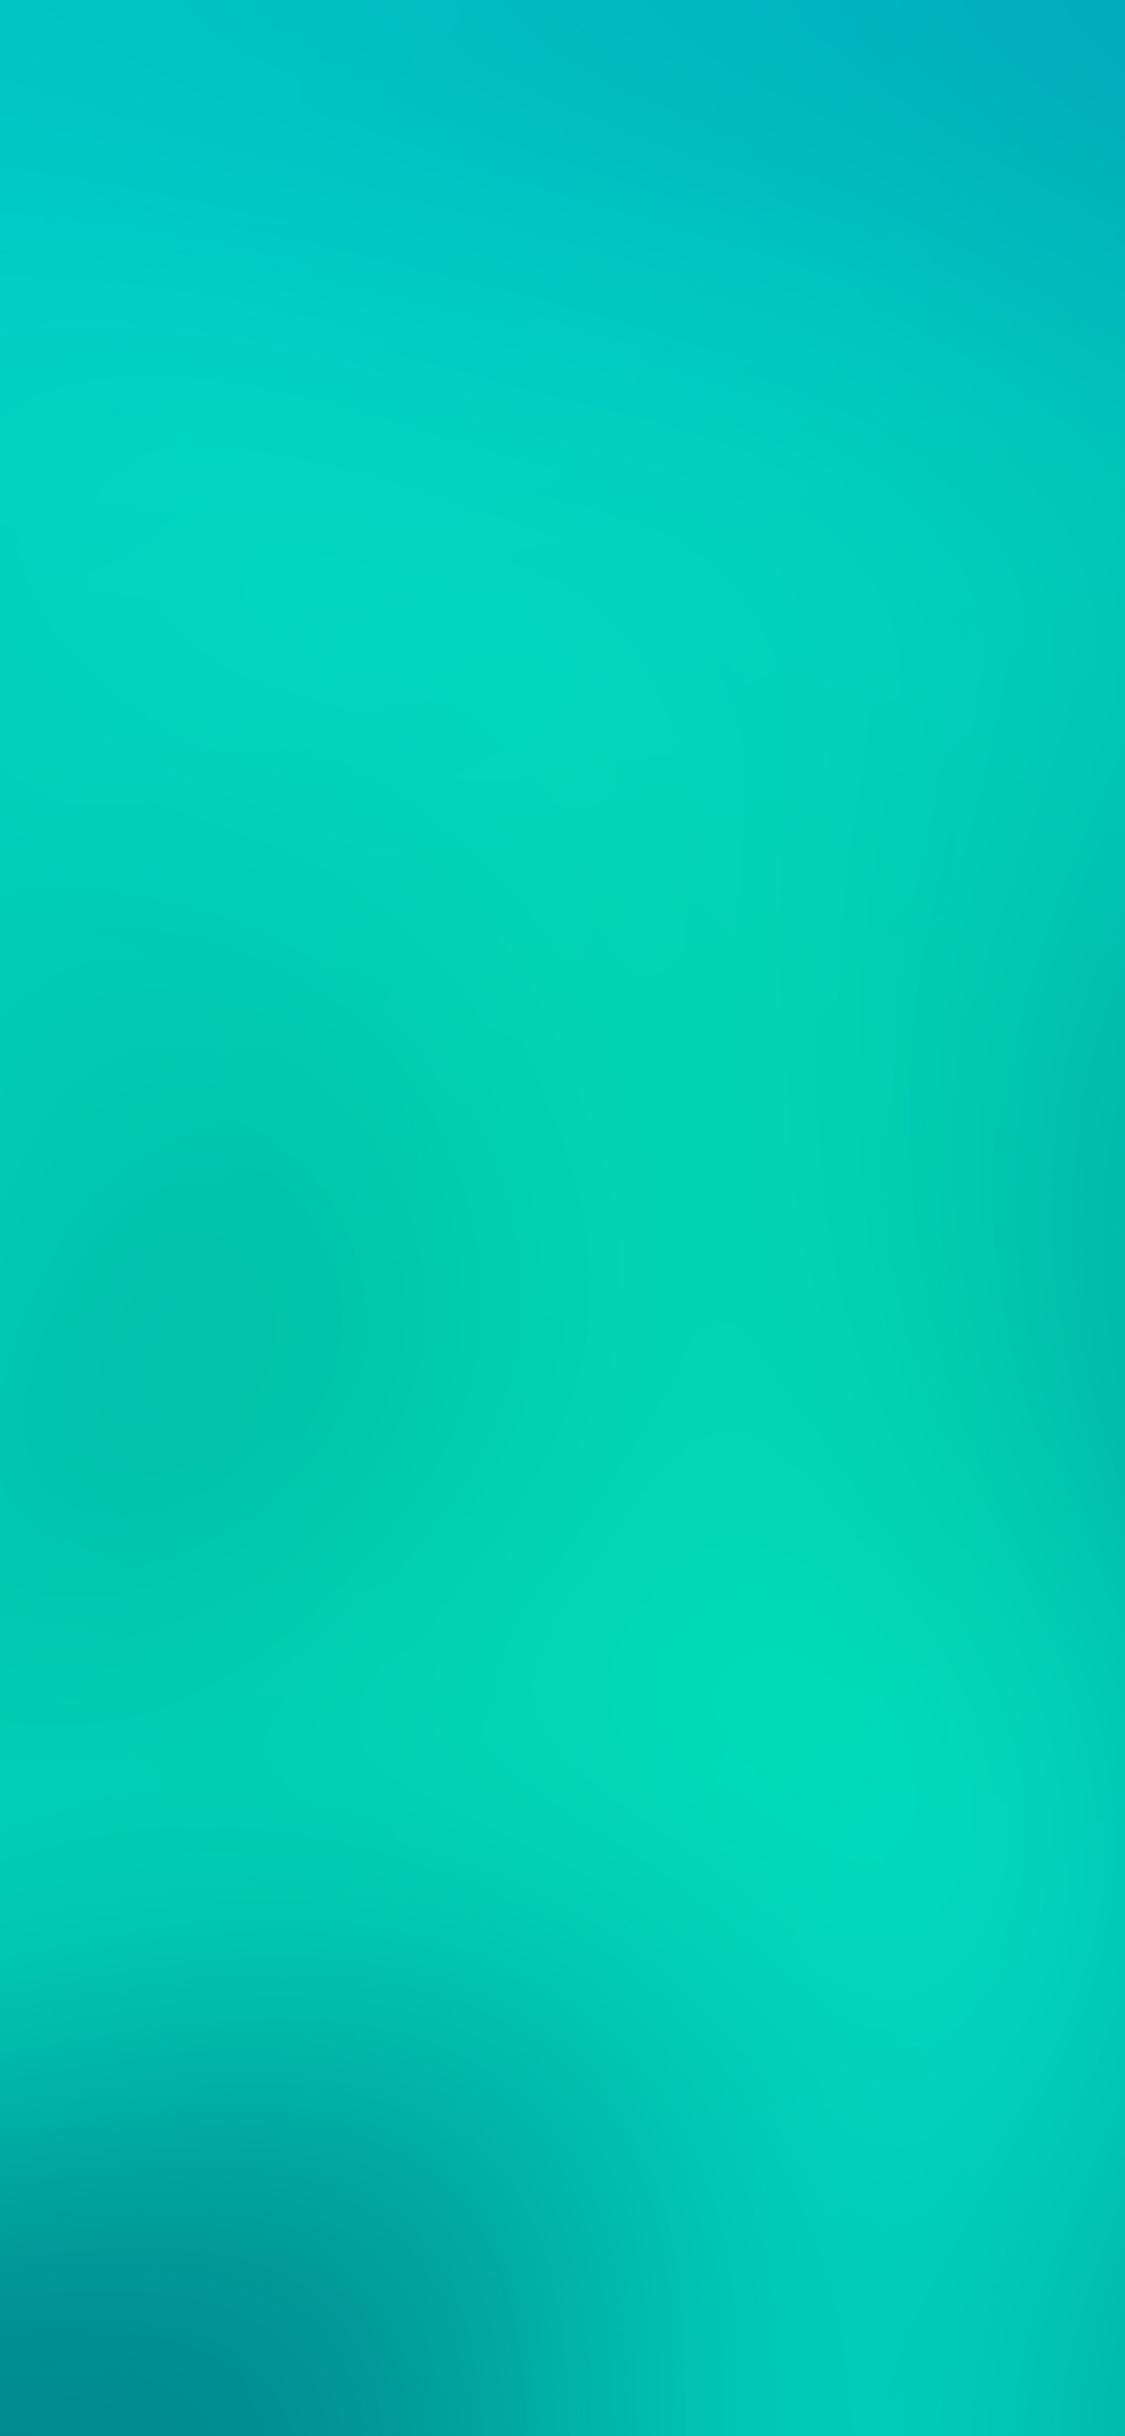 iPhoneXpapers.com-Apple-iPhone-wallpaper-sa06-bleen-green-blur